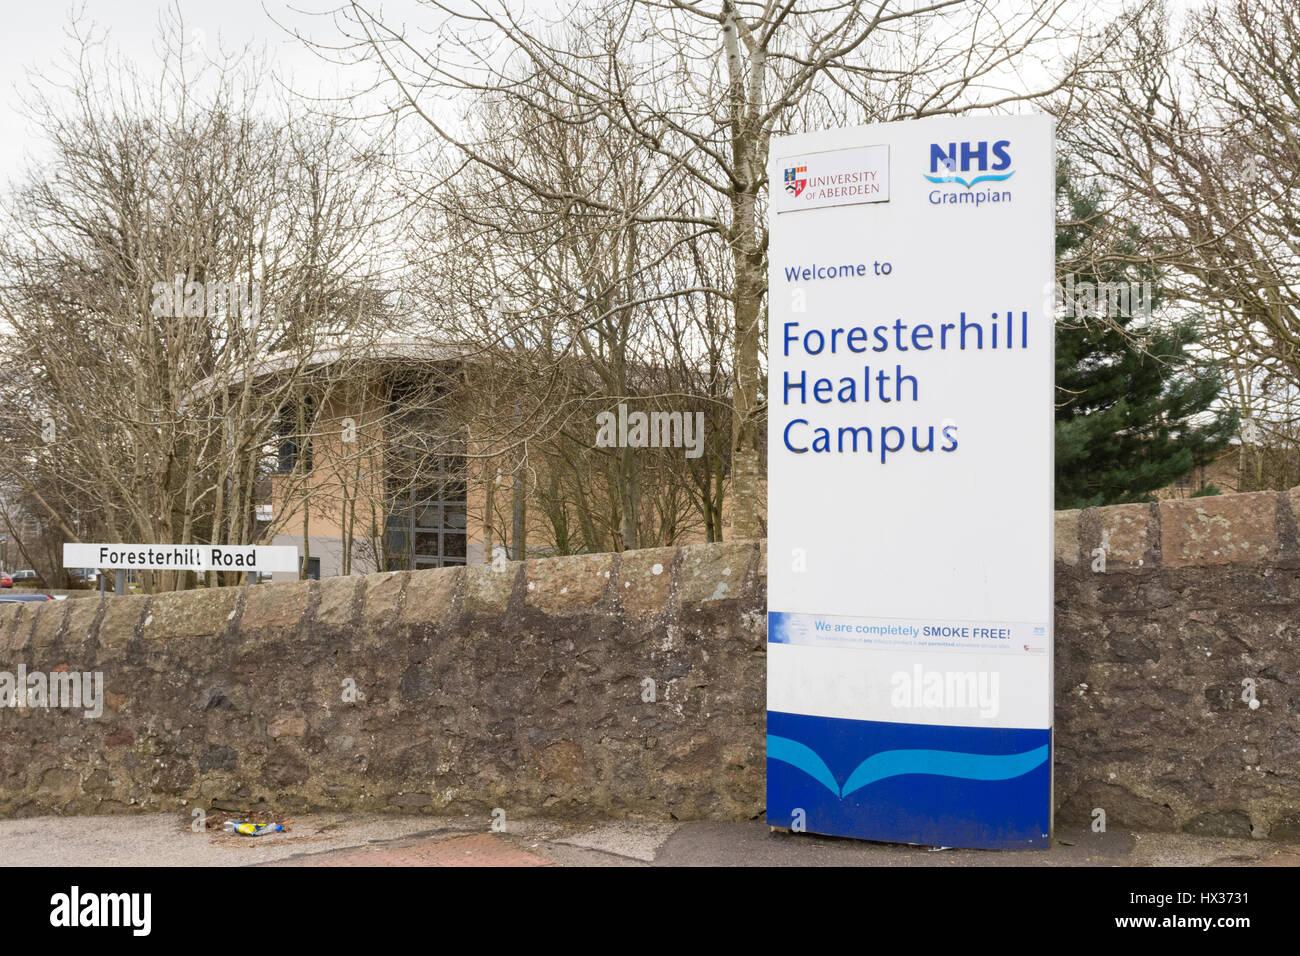 Foresterhill Health Campus, Aberdeen, Scotland, UK - Stock Image